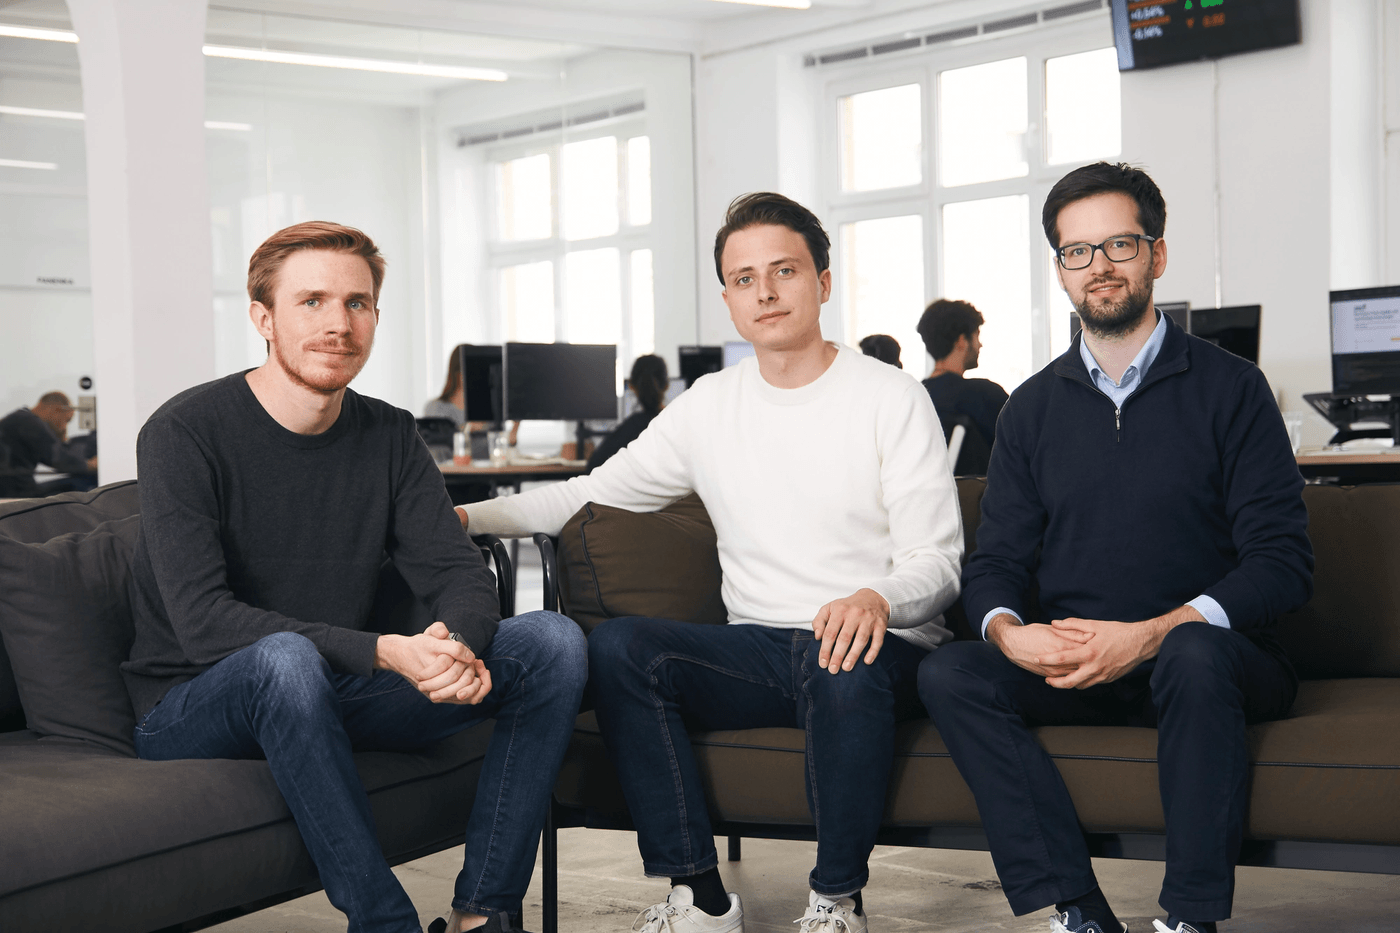 Christian Hecker, Thomas Pischke et Marco Cancellieri